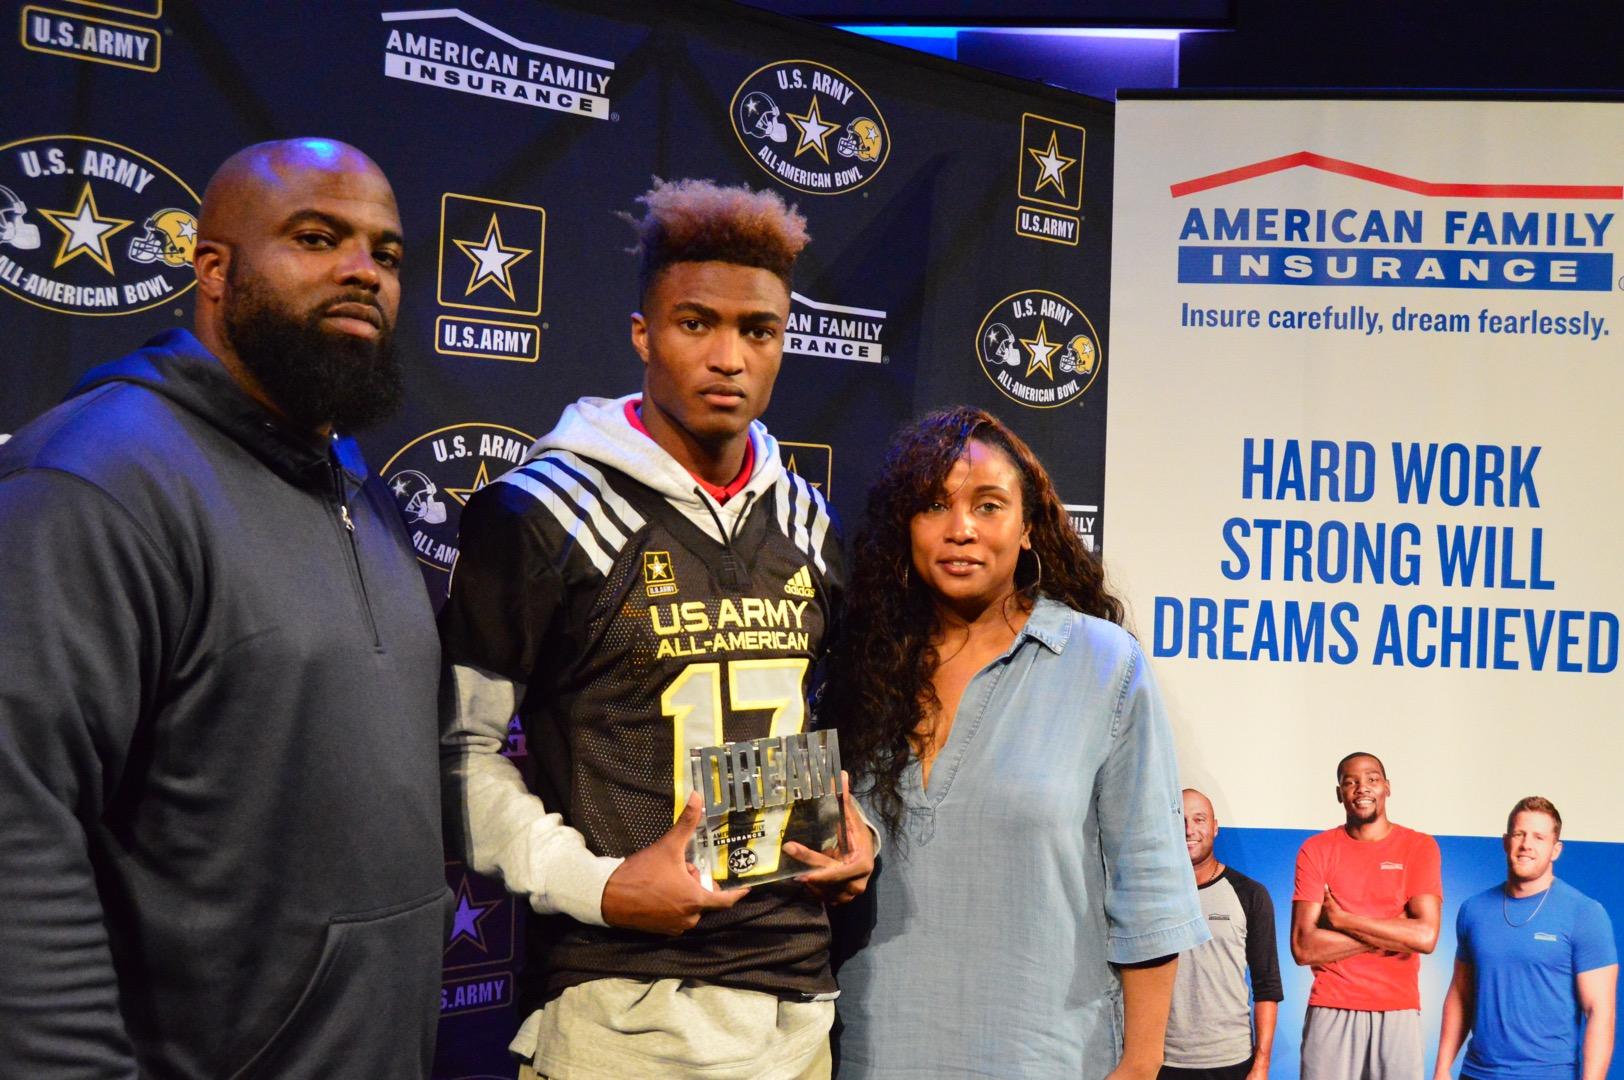 Shaun Wade presented his parents, Randy and Gwen Wade, with the Dream Champion Award. (Photo: AAG)